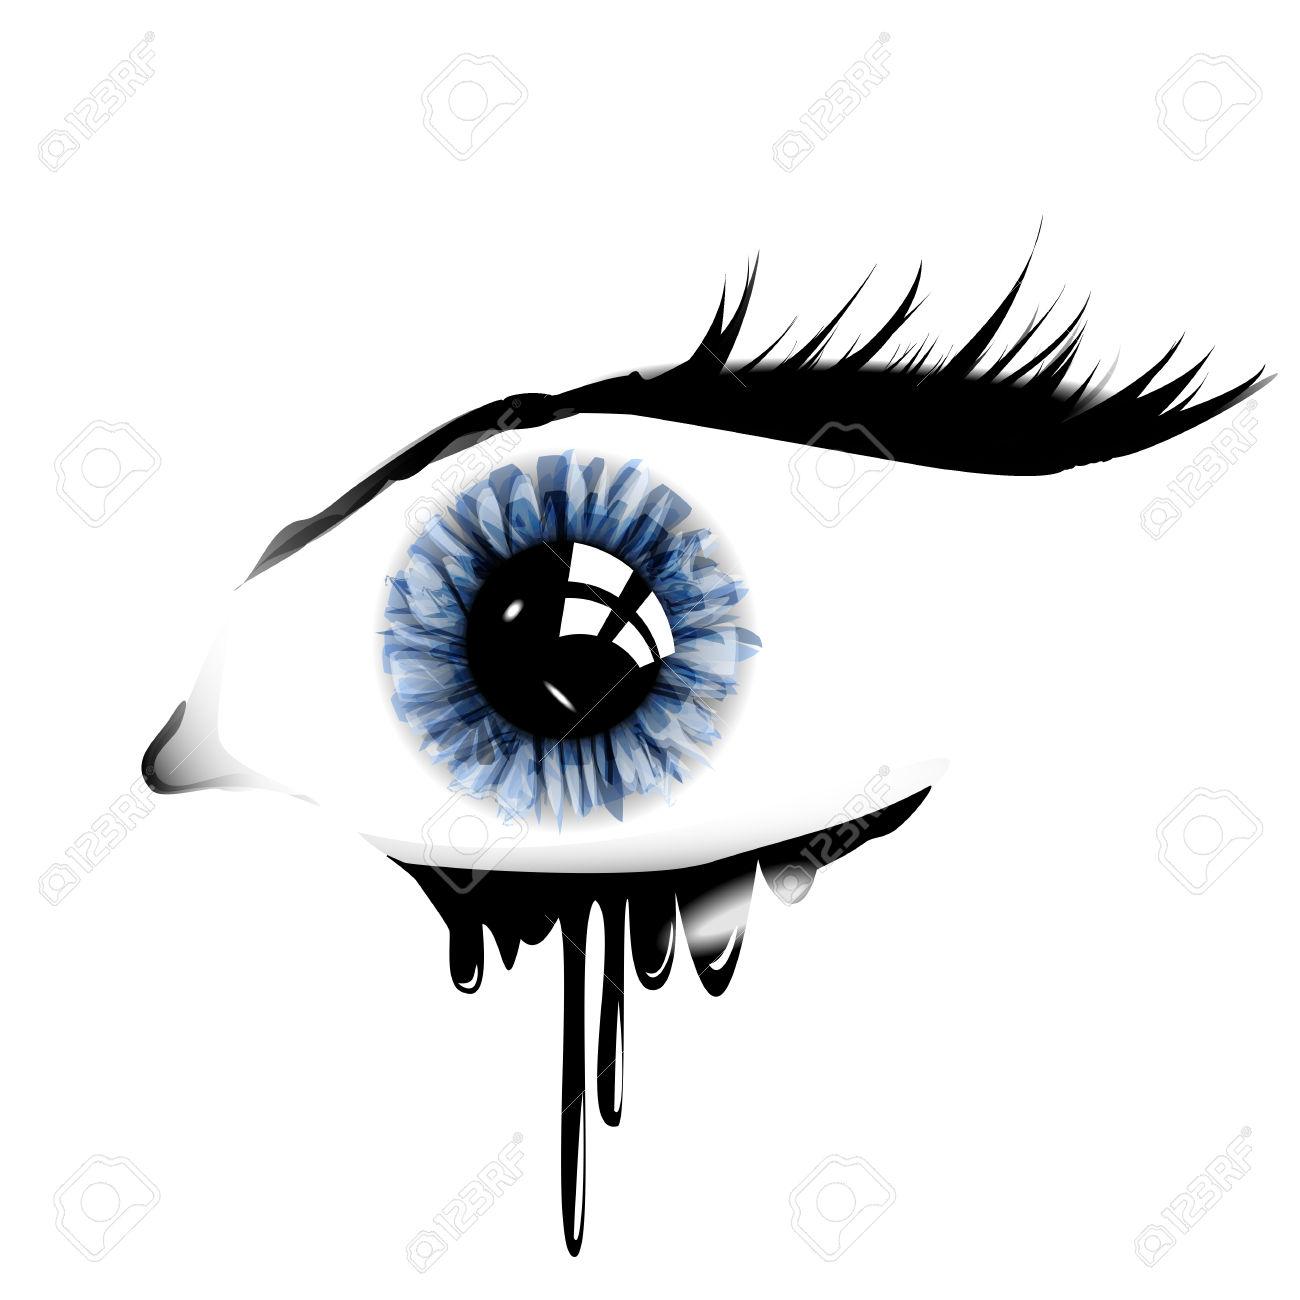 eye with tears clipart #12